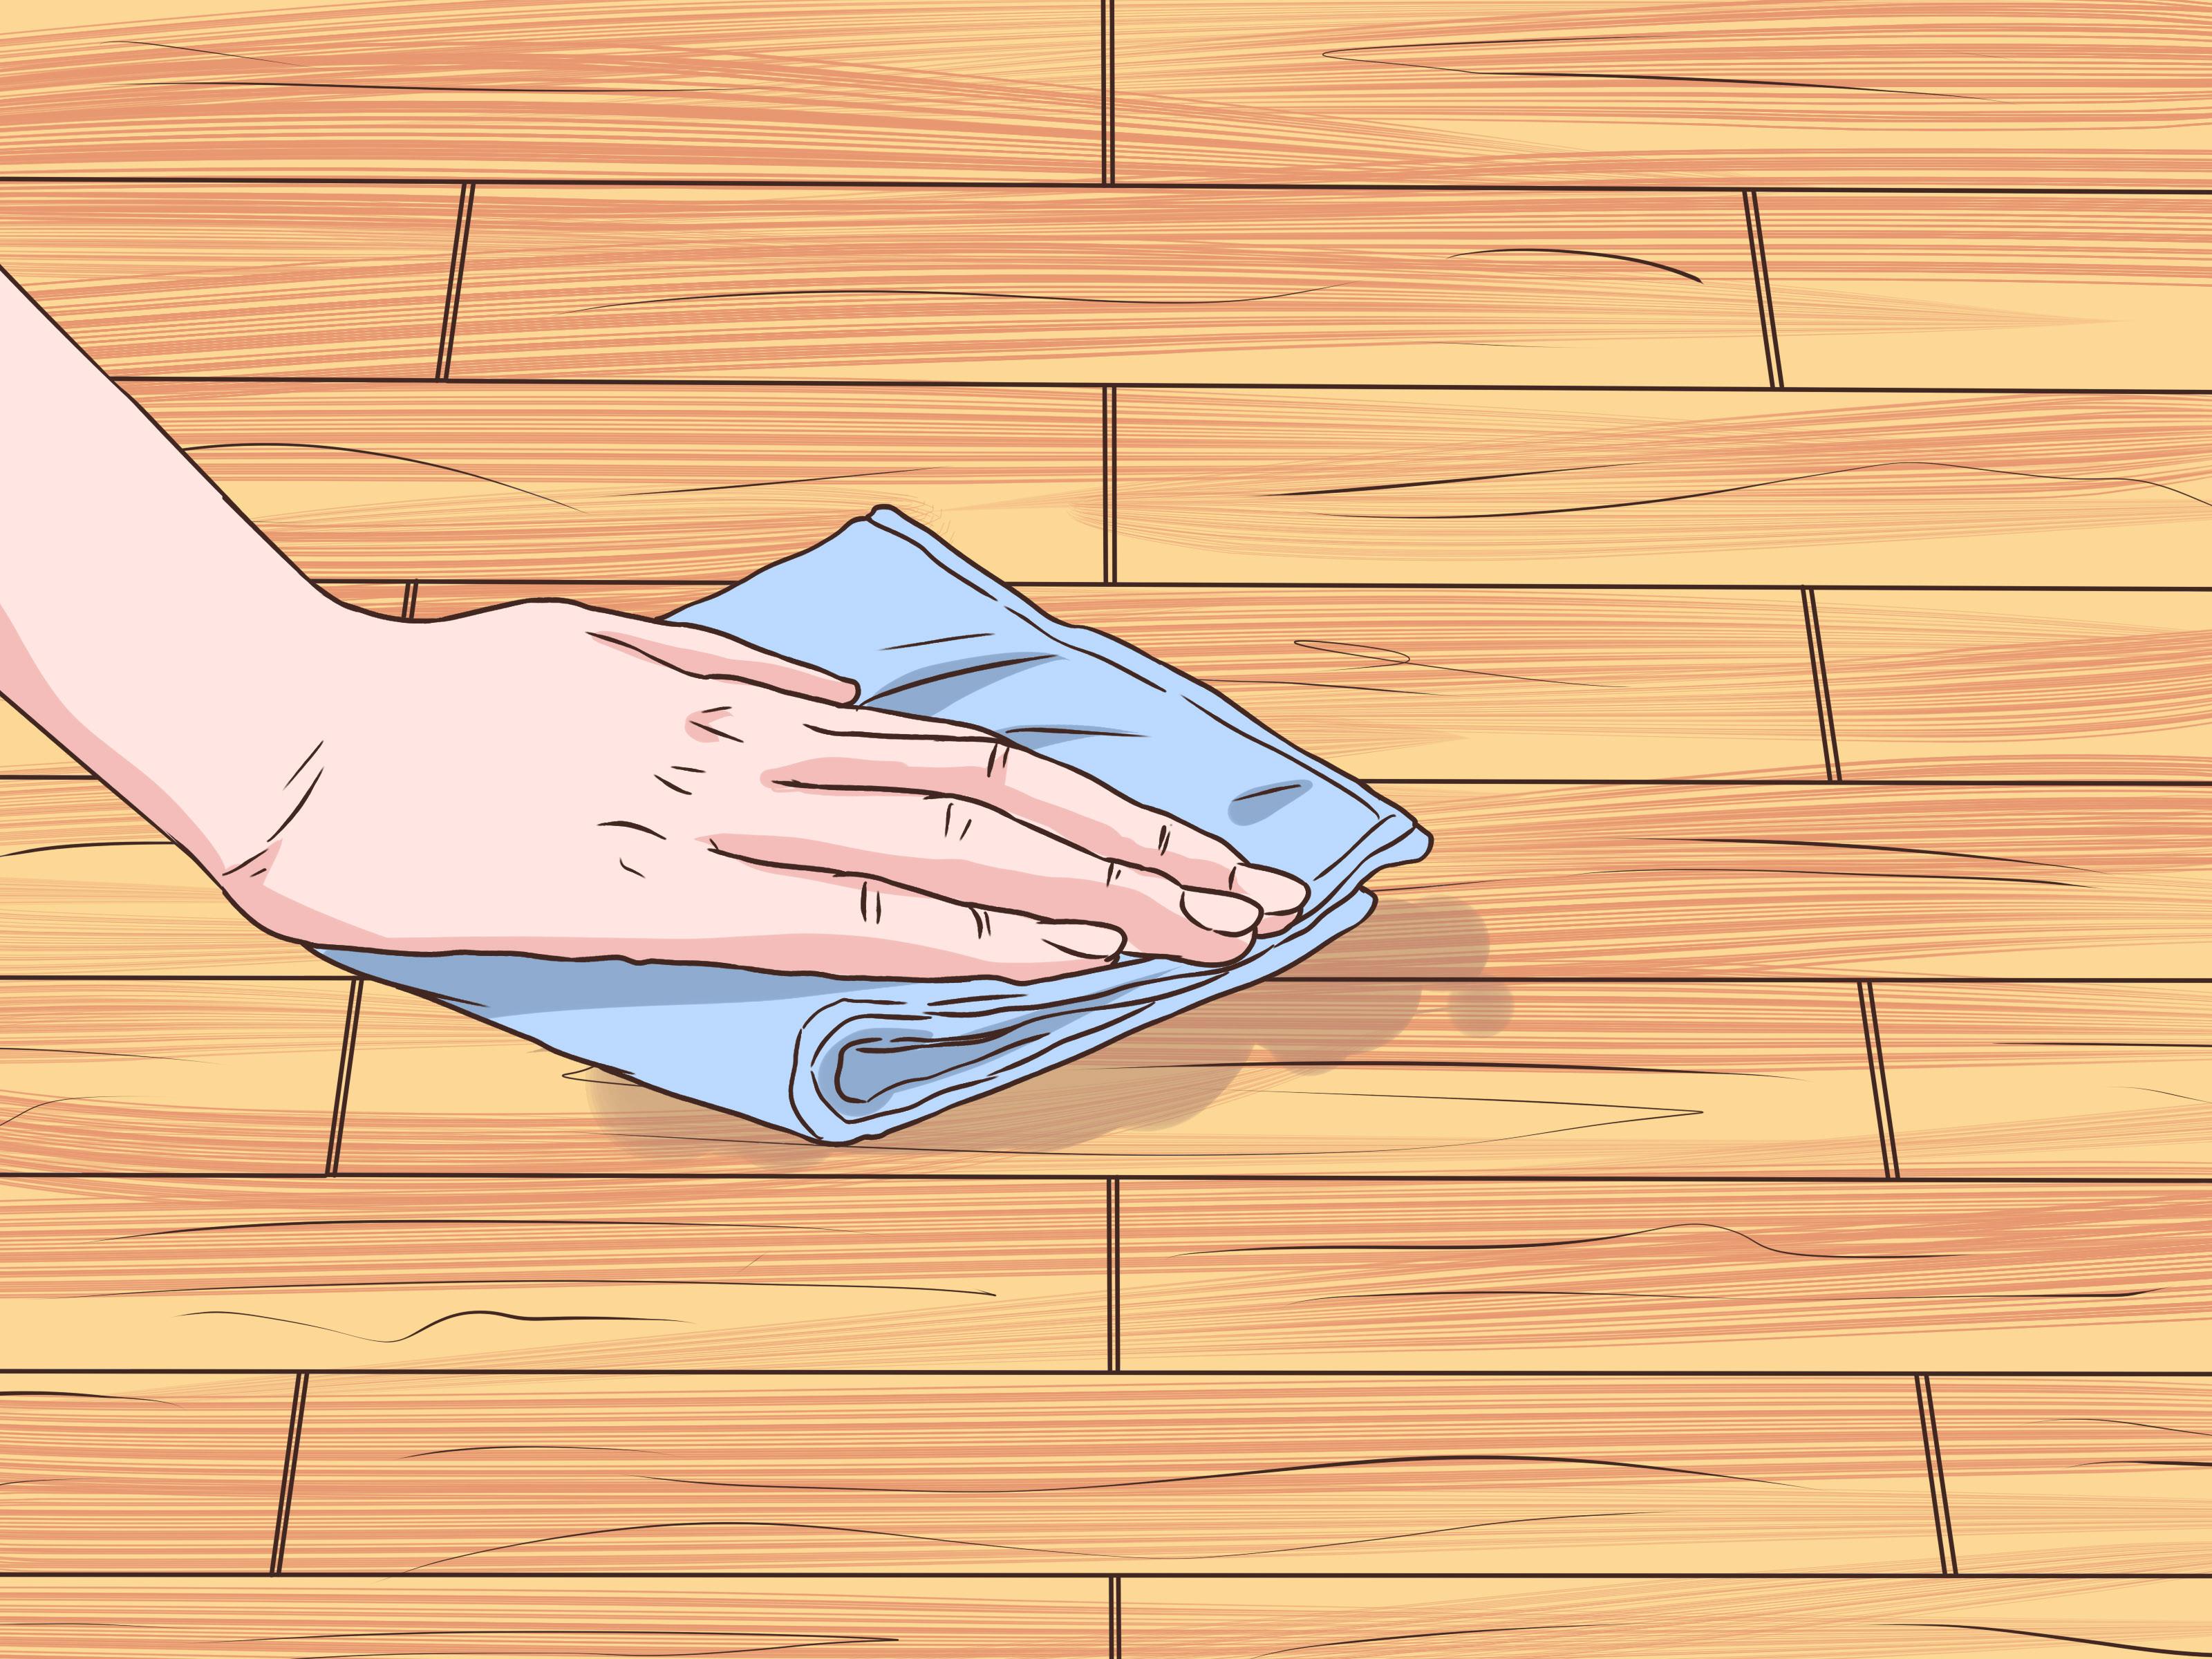 engineered hardwood flooring vs hardwood of how to clean sticky hardwood floors 9 steps with pictures pertaining to clean sticky hardwood floors step 9